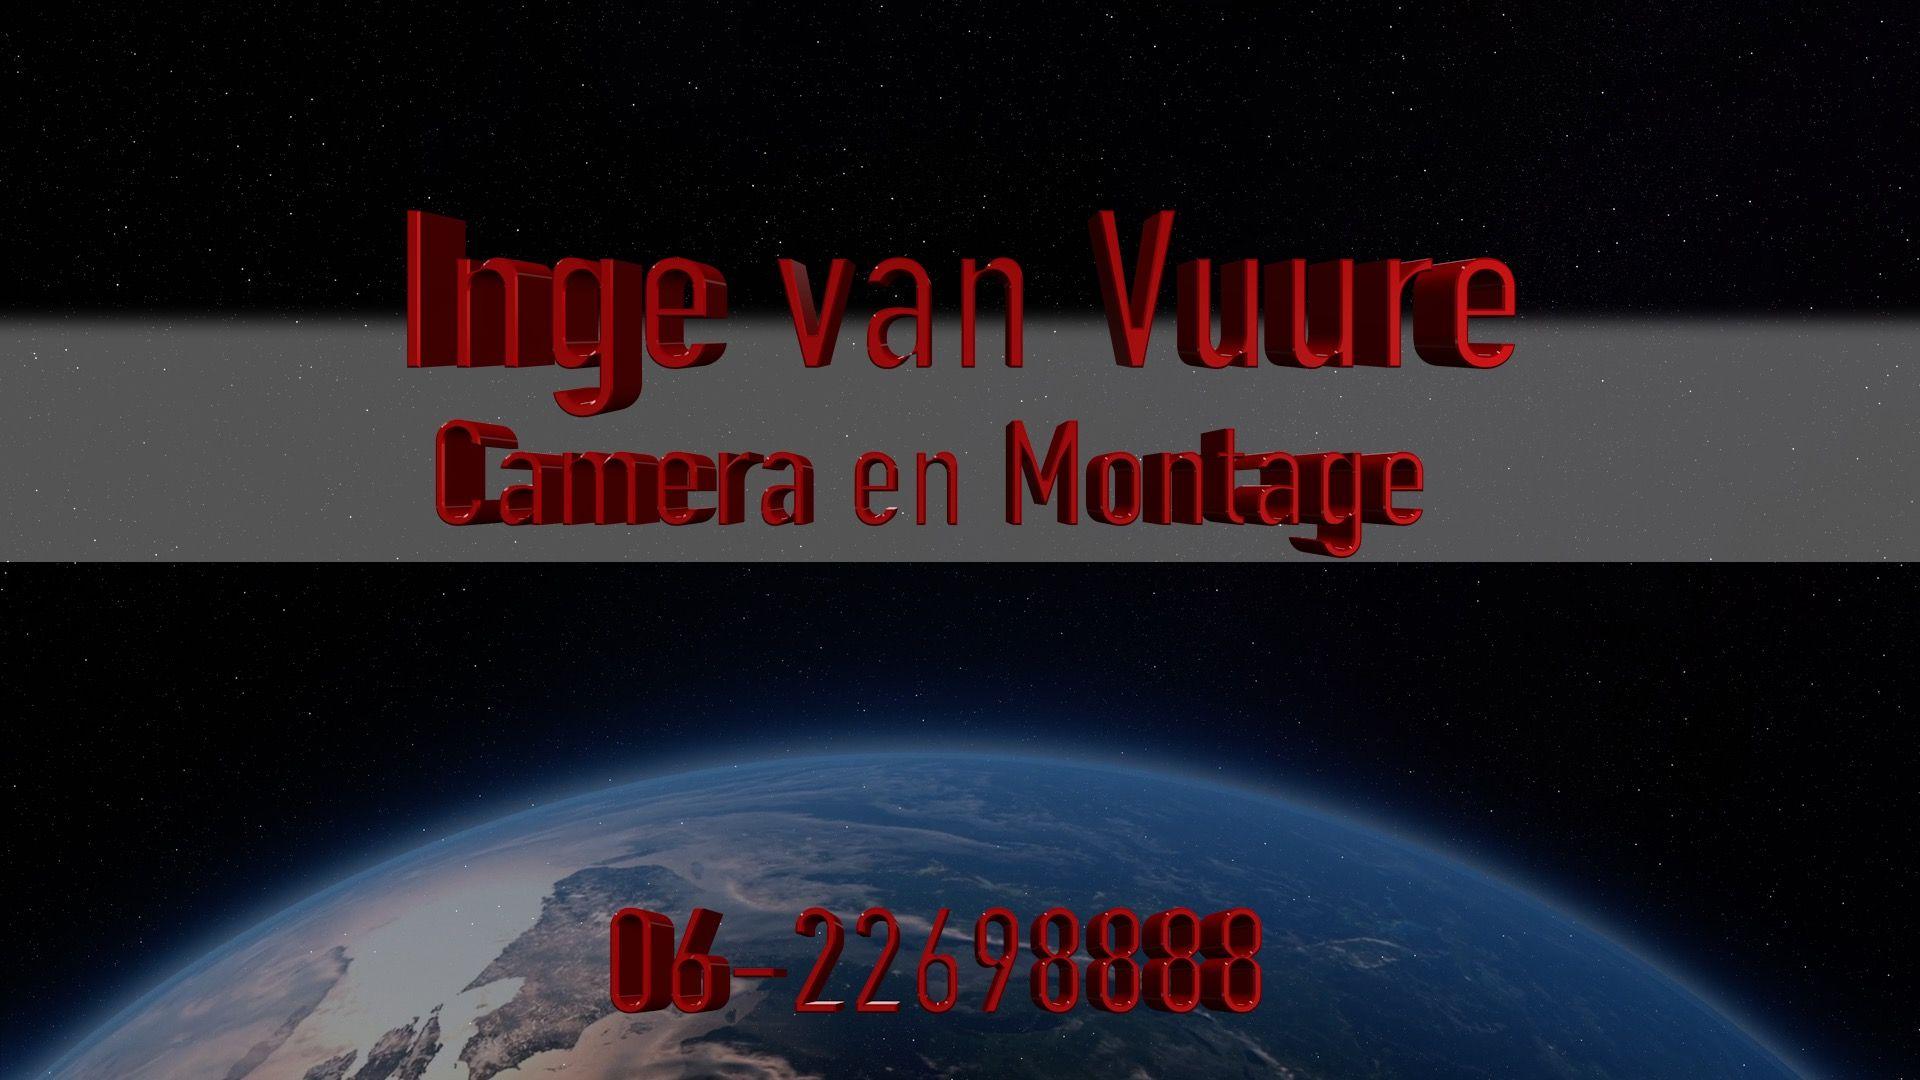 Logo Inge